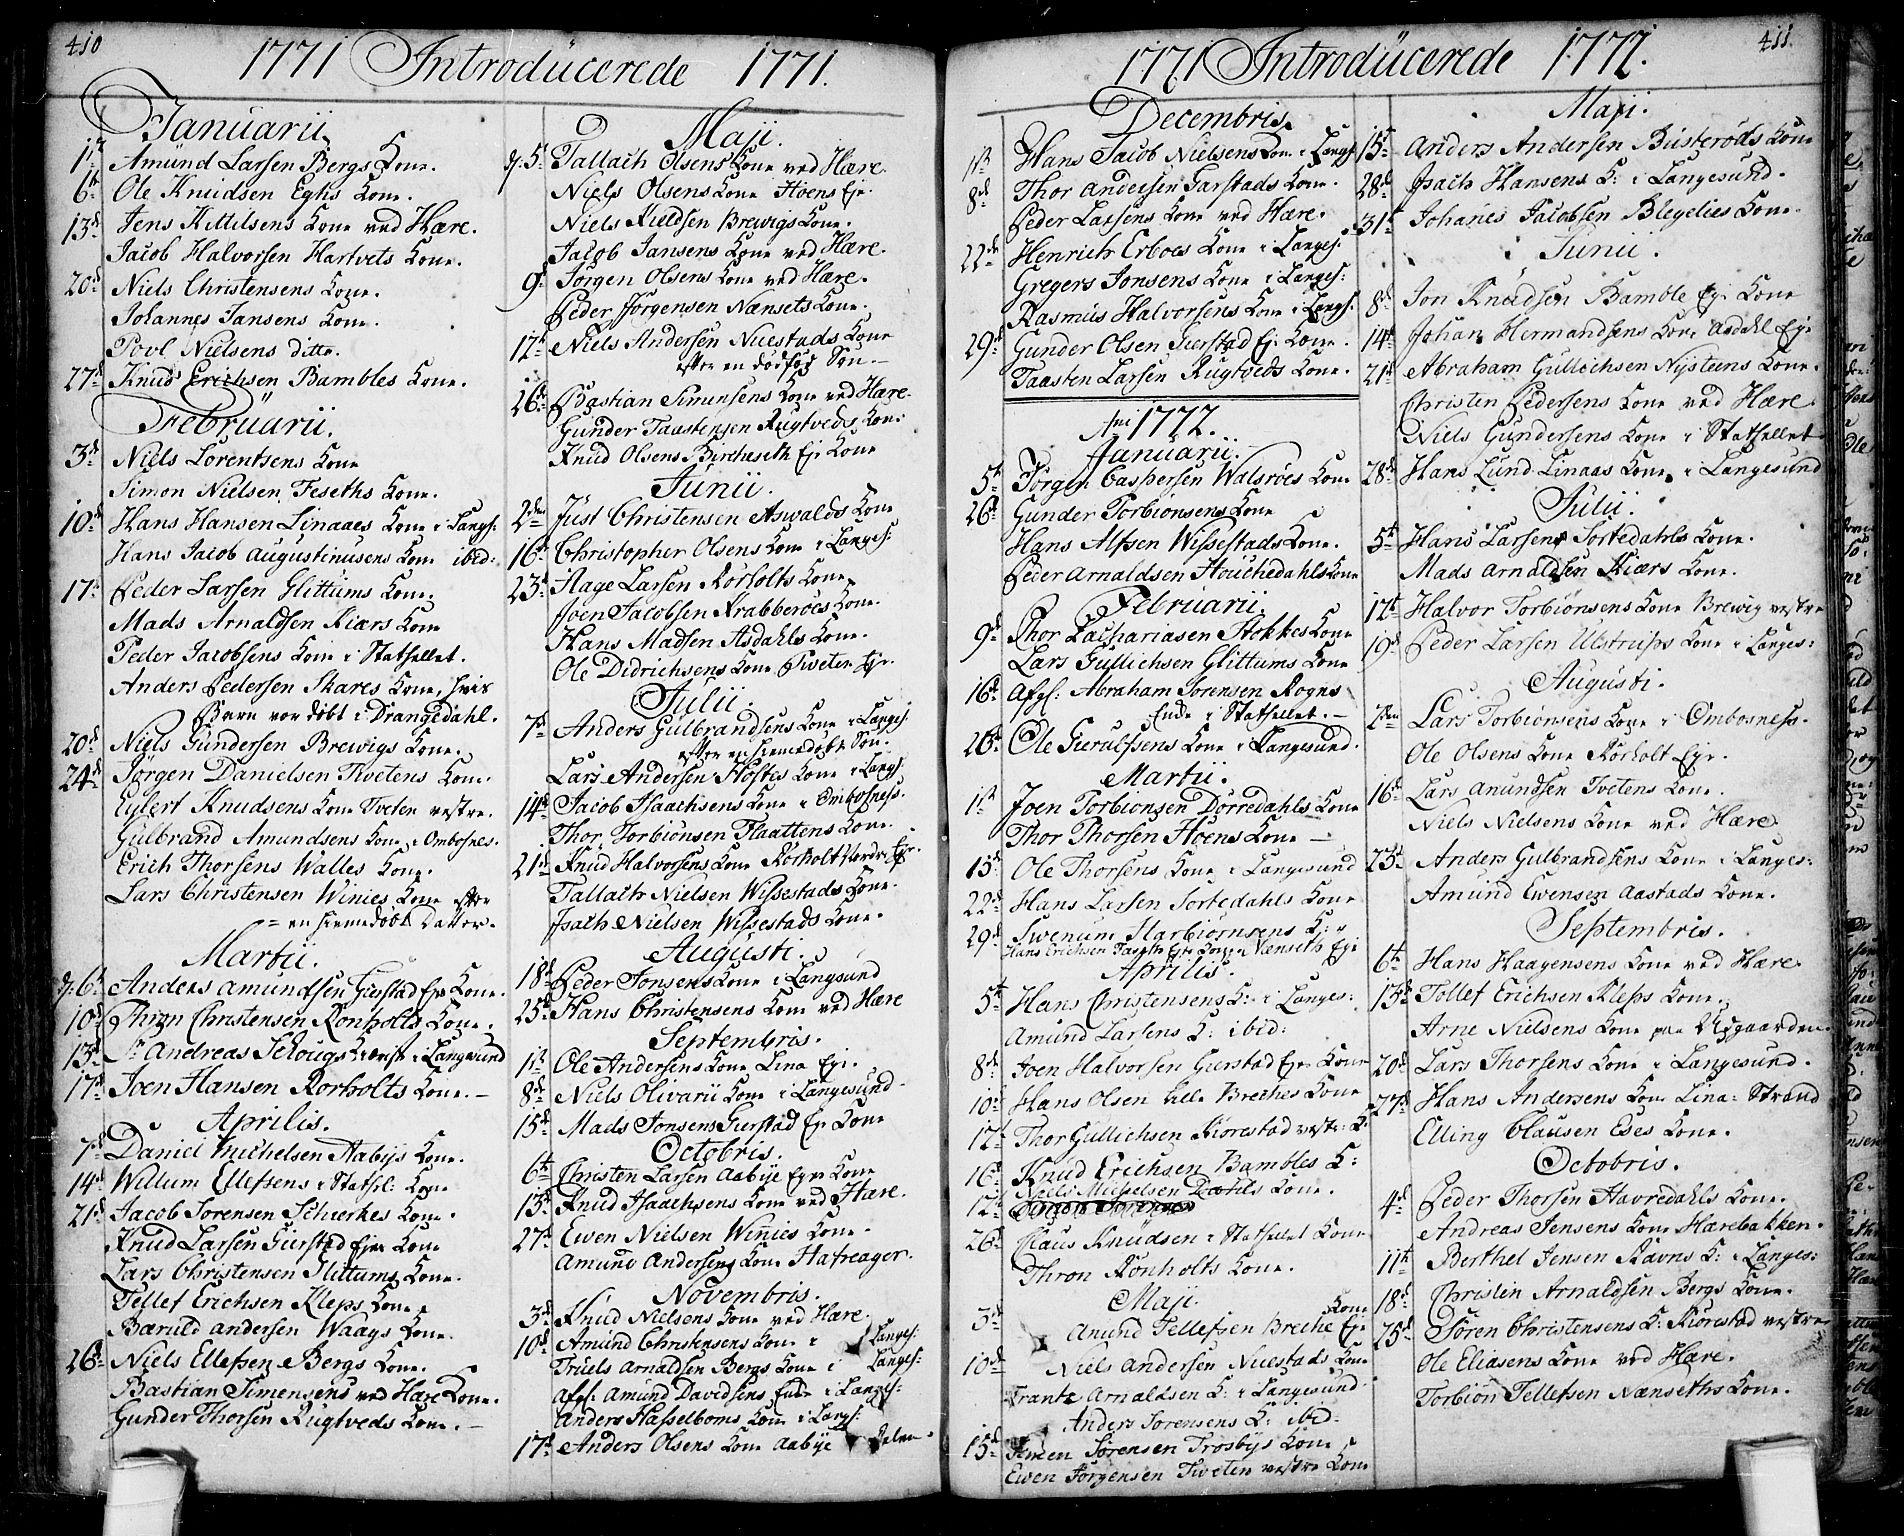 SAKO, Bamble kirkebøker, F/Fa/L0001: Ministerialbok nr. I 1, 1702-1774, s. 410-411